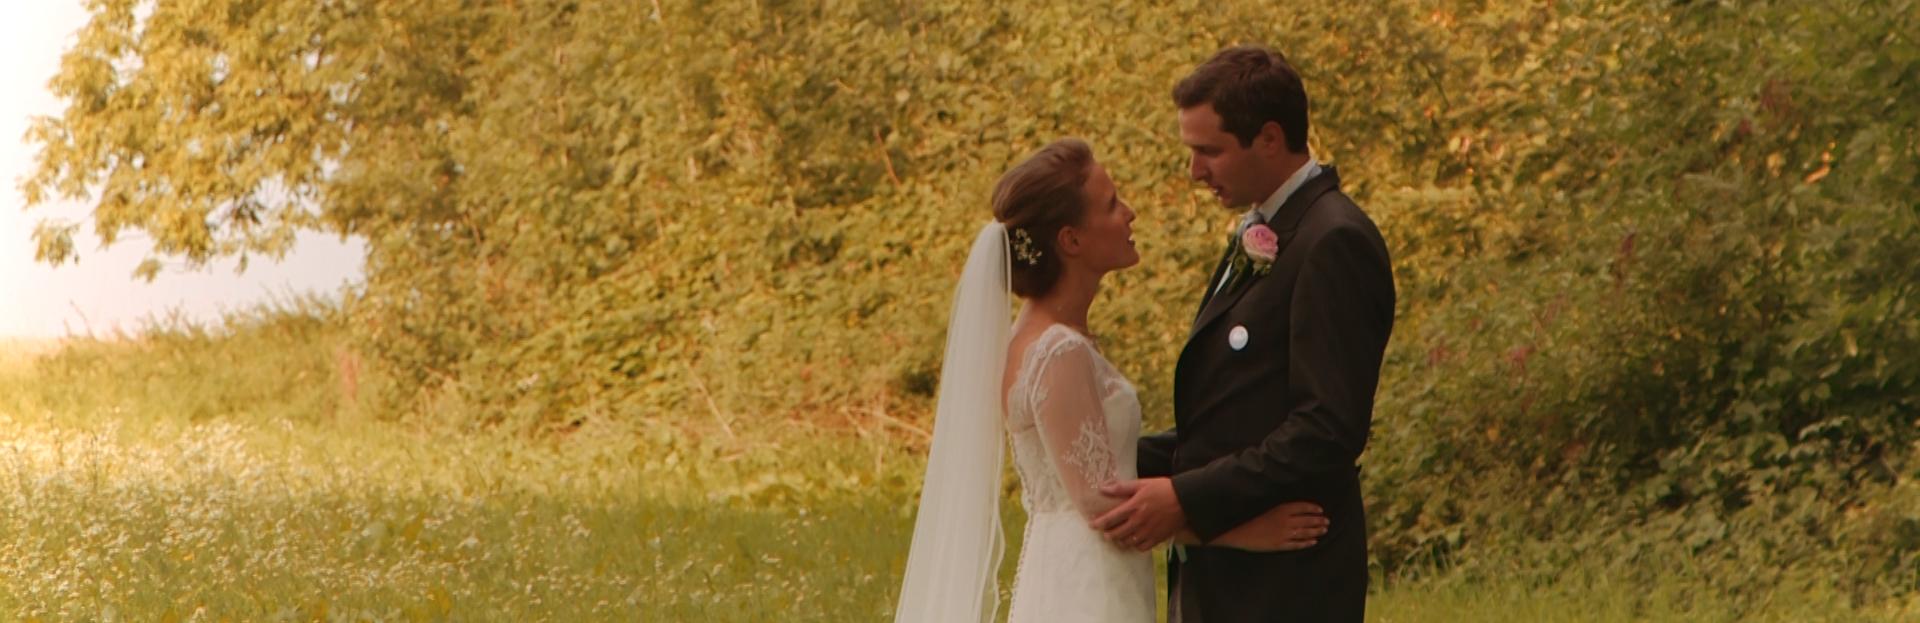 film, mariage, vidéo, vidéaste, caméraman